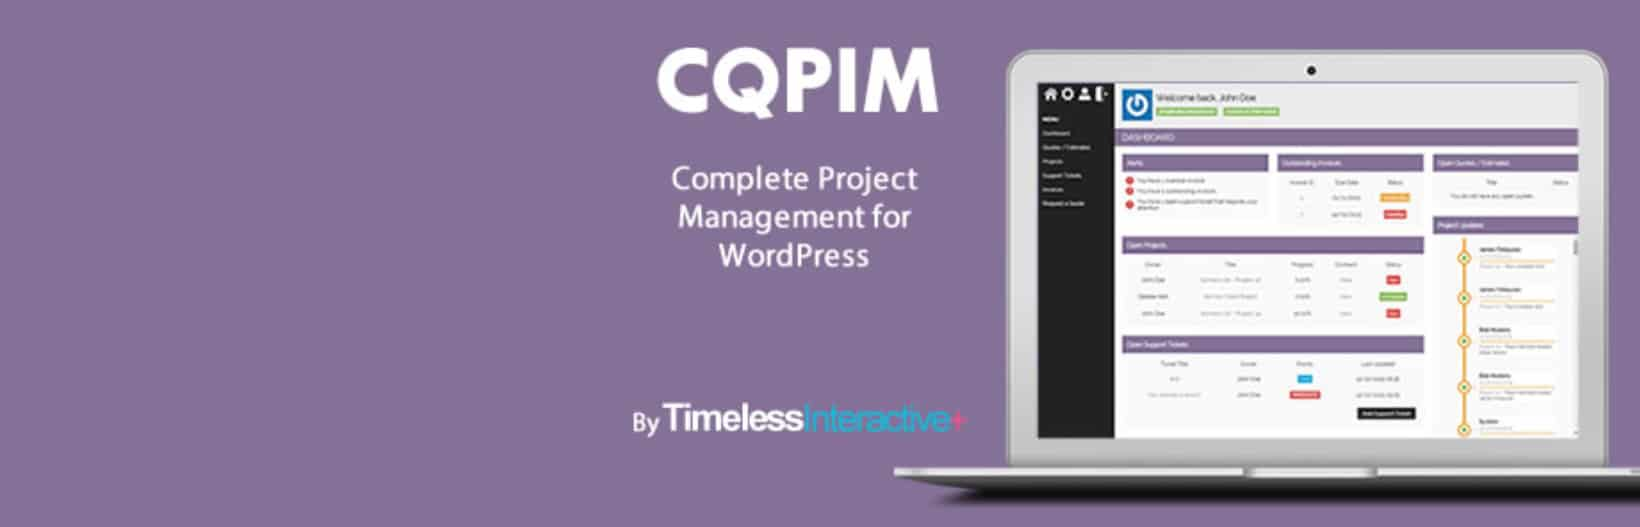 Top 6 WordPress Project Management Plugins (2019)